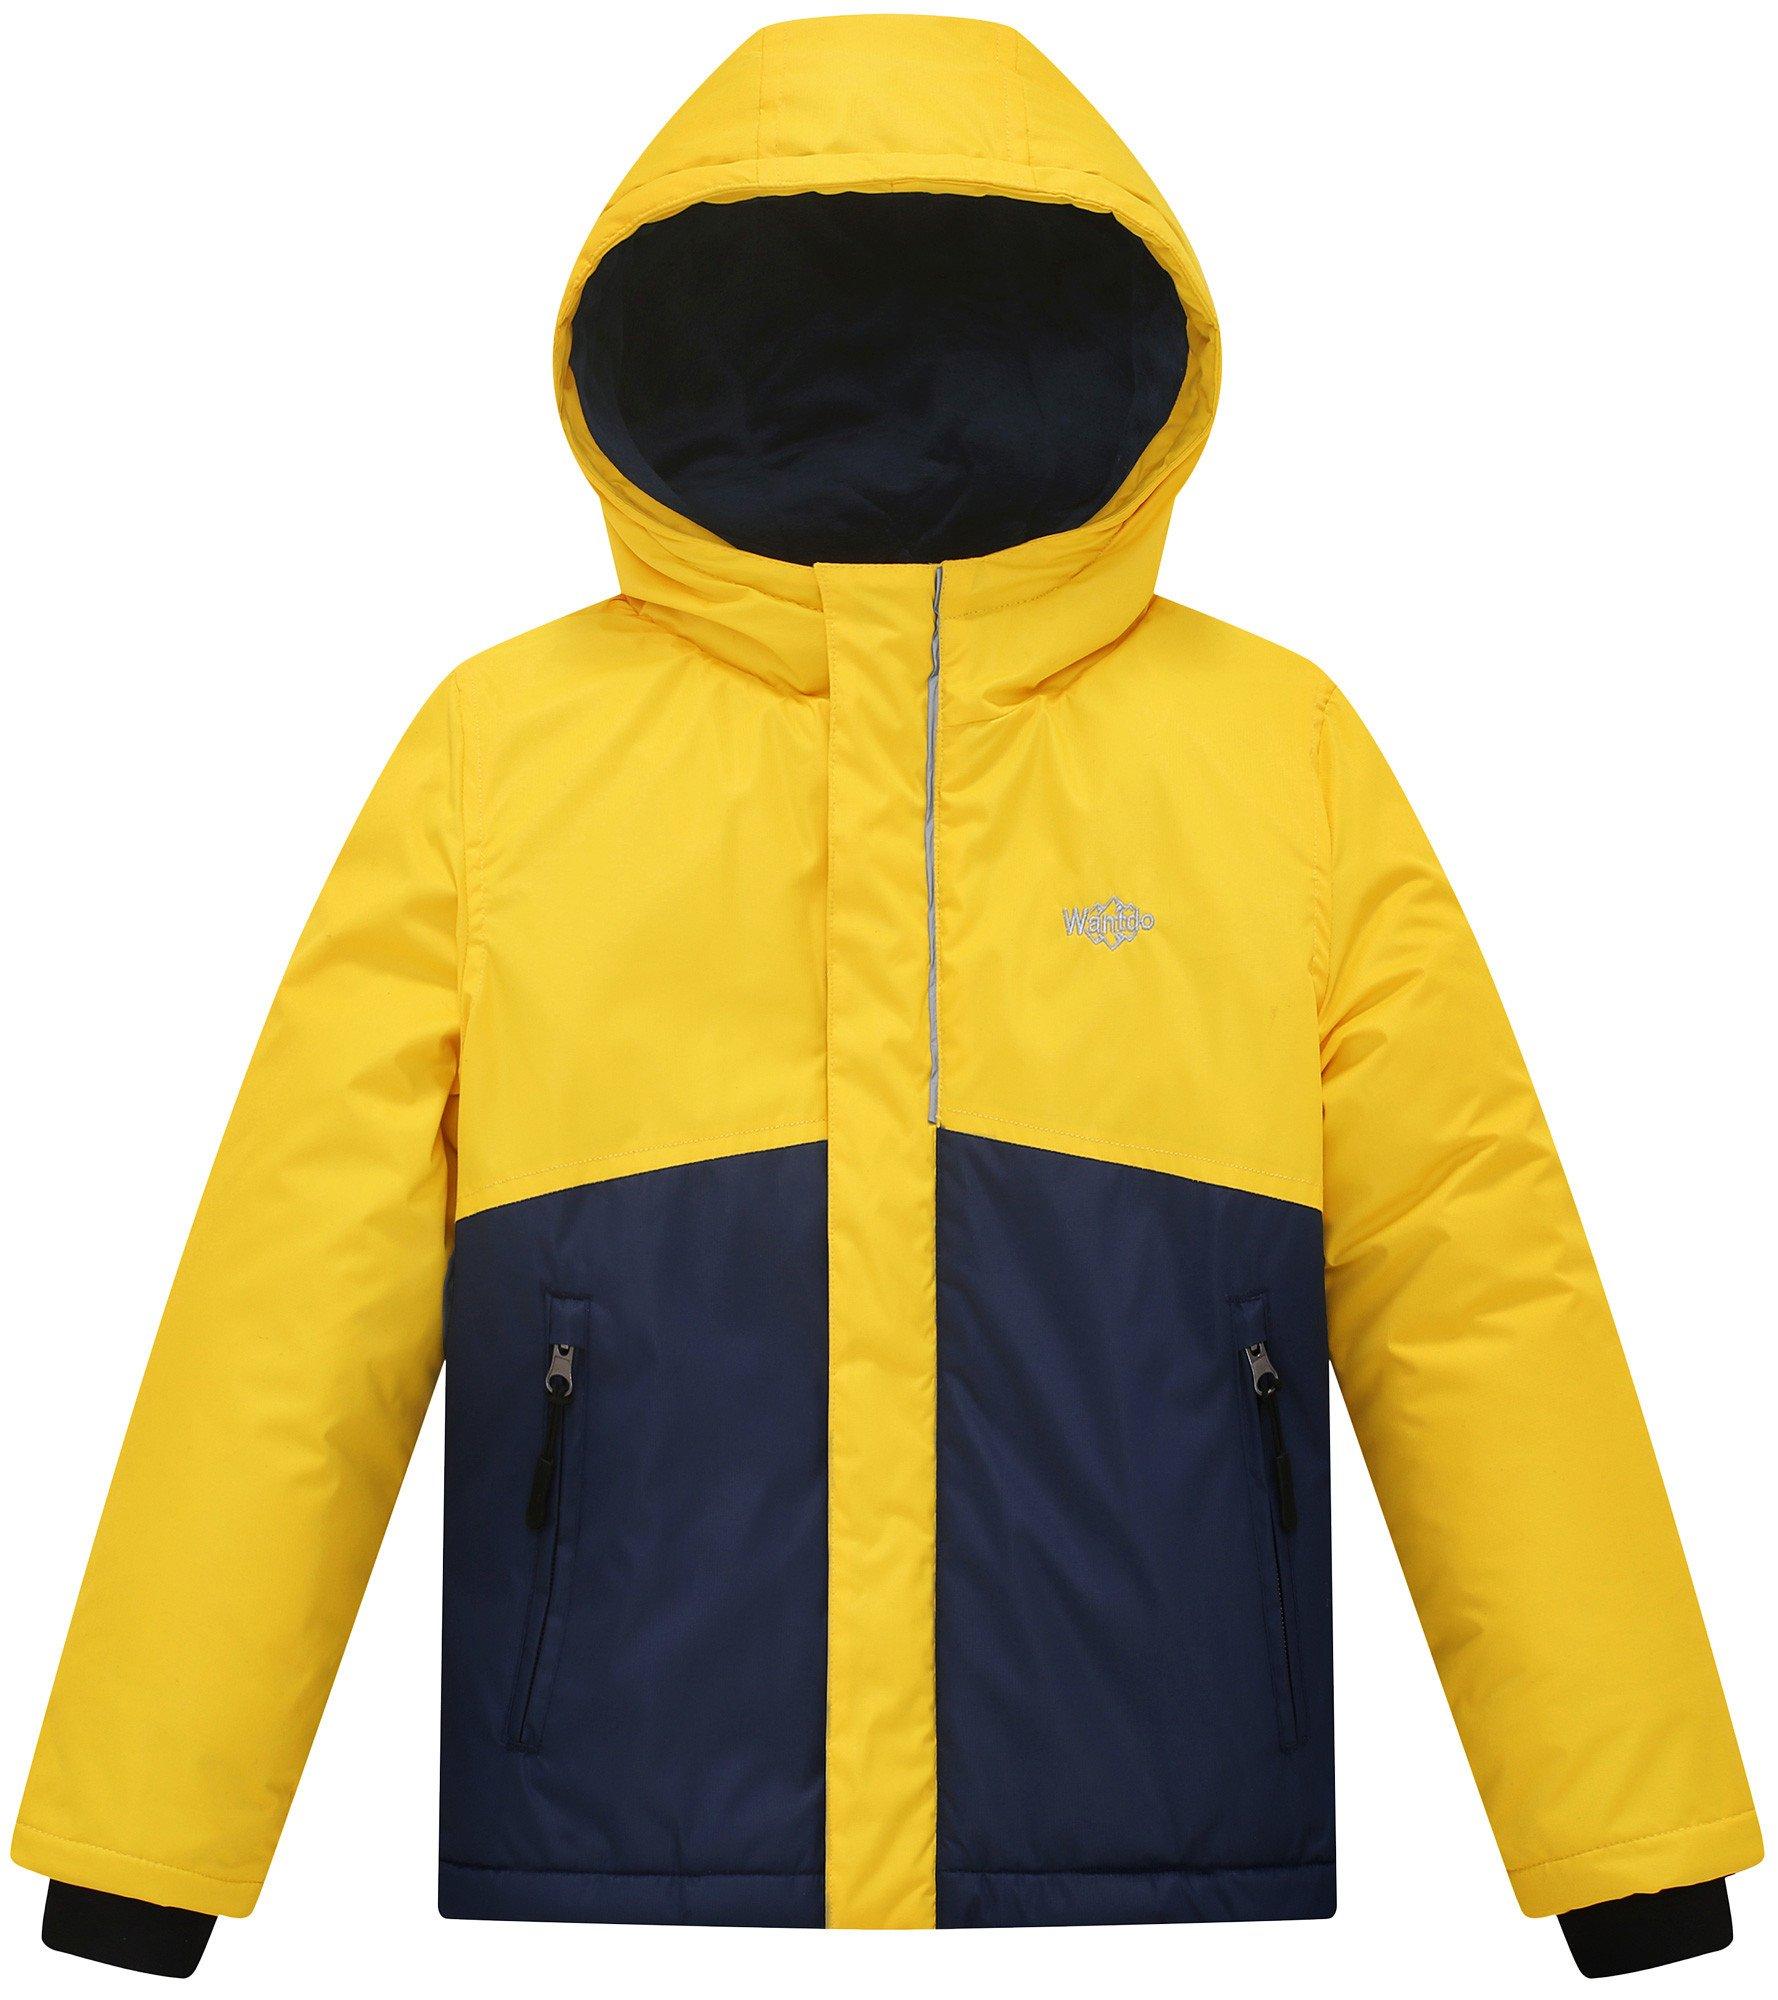 Wantdo Boy's Waterproof Quilted Ski Jacket Cotton Padded Coat Hooded Rainwear(Yellow+Dark Blue, 6/7)